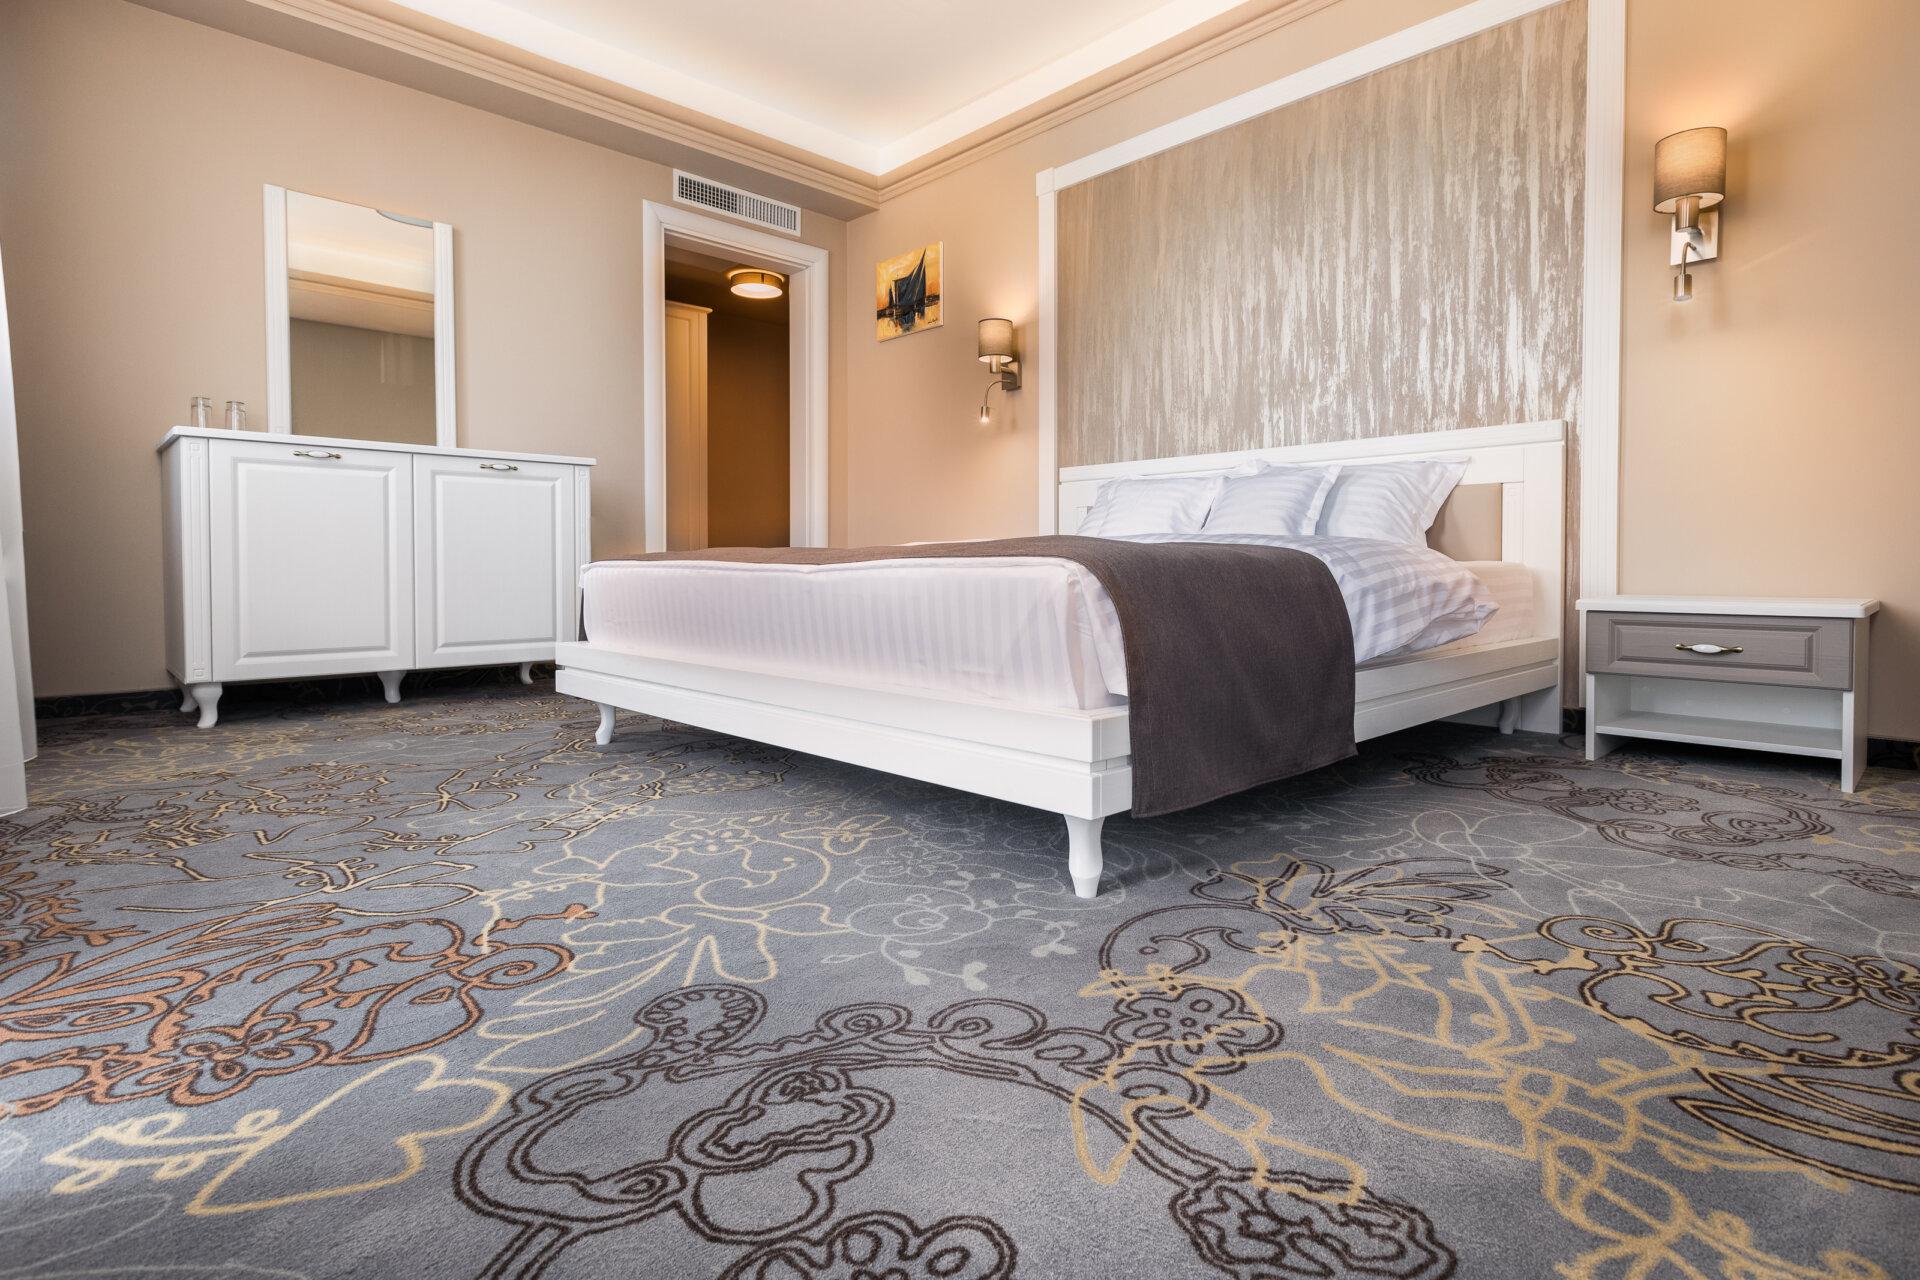 20210524-carpet&more-mamaia-hotel-scapino-junior-by-hugmedia-011